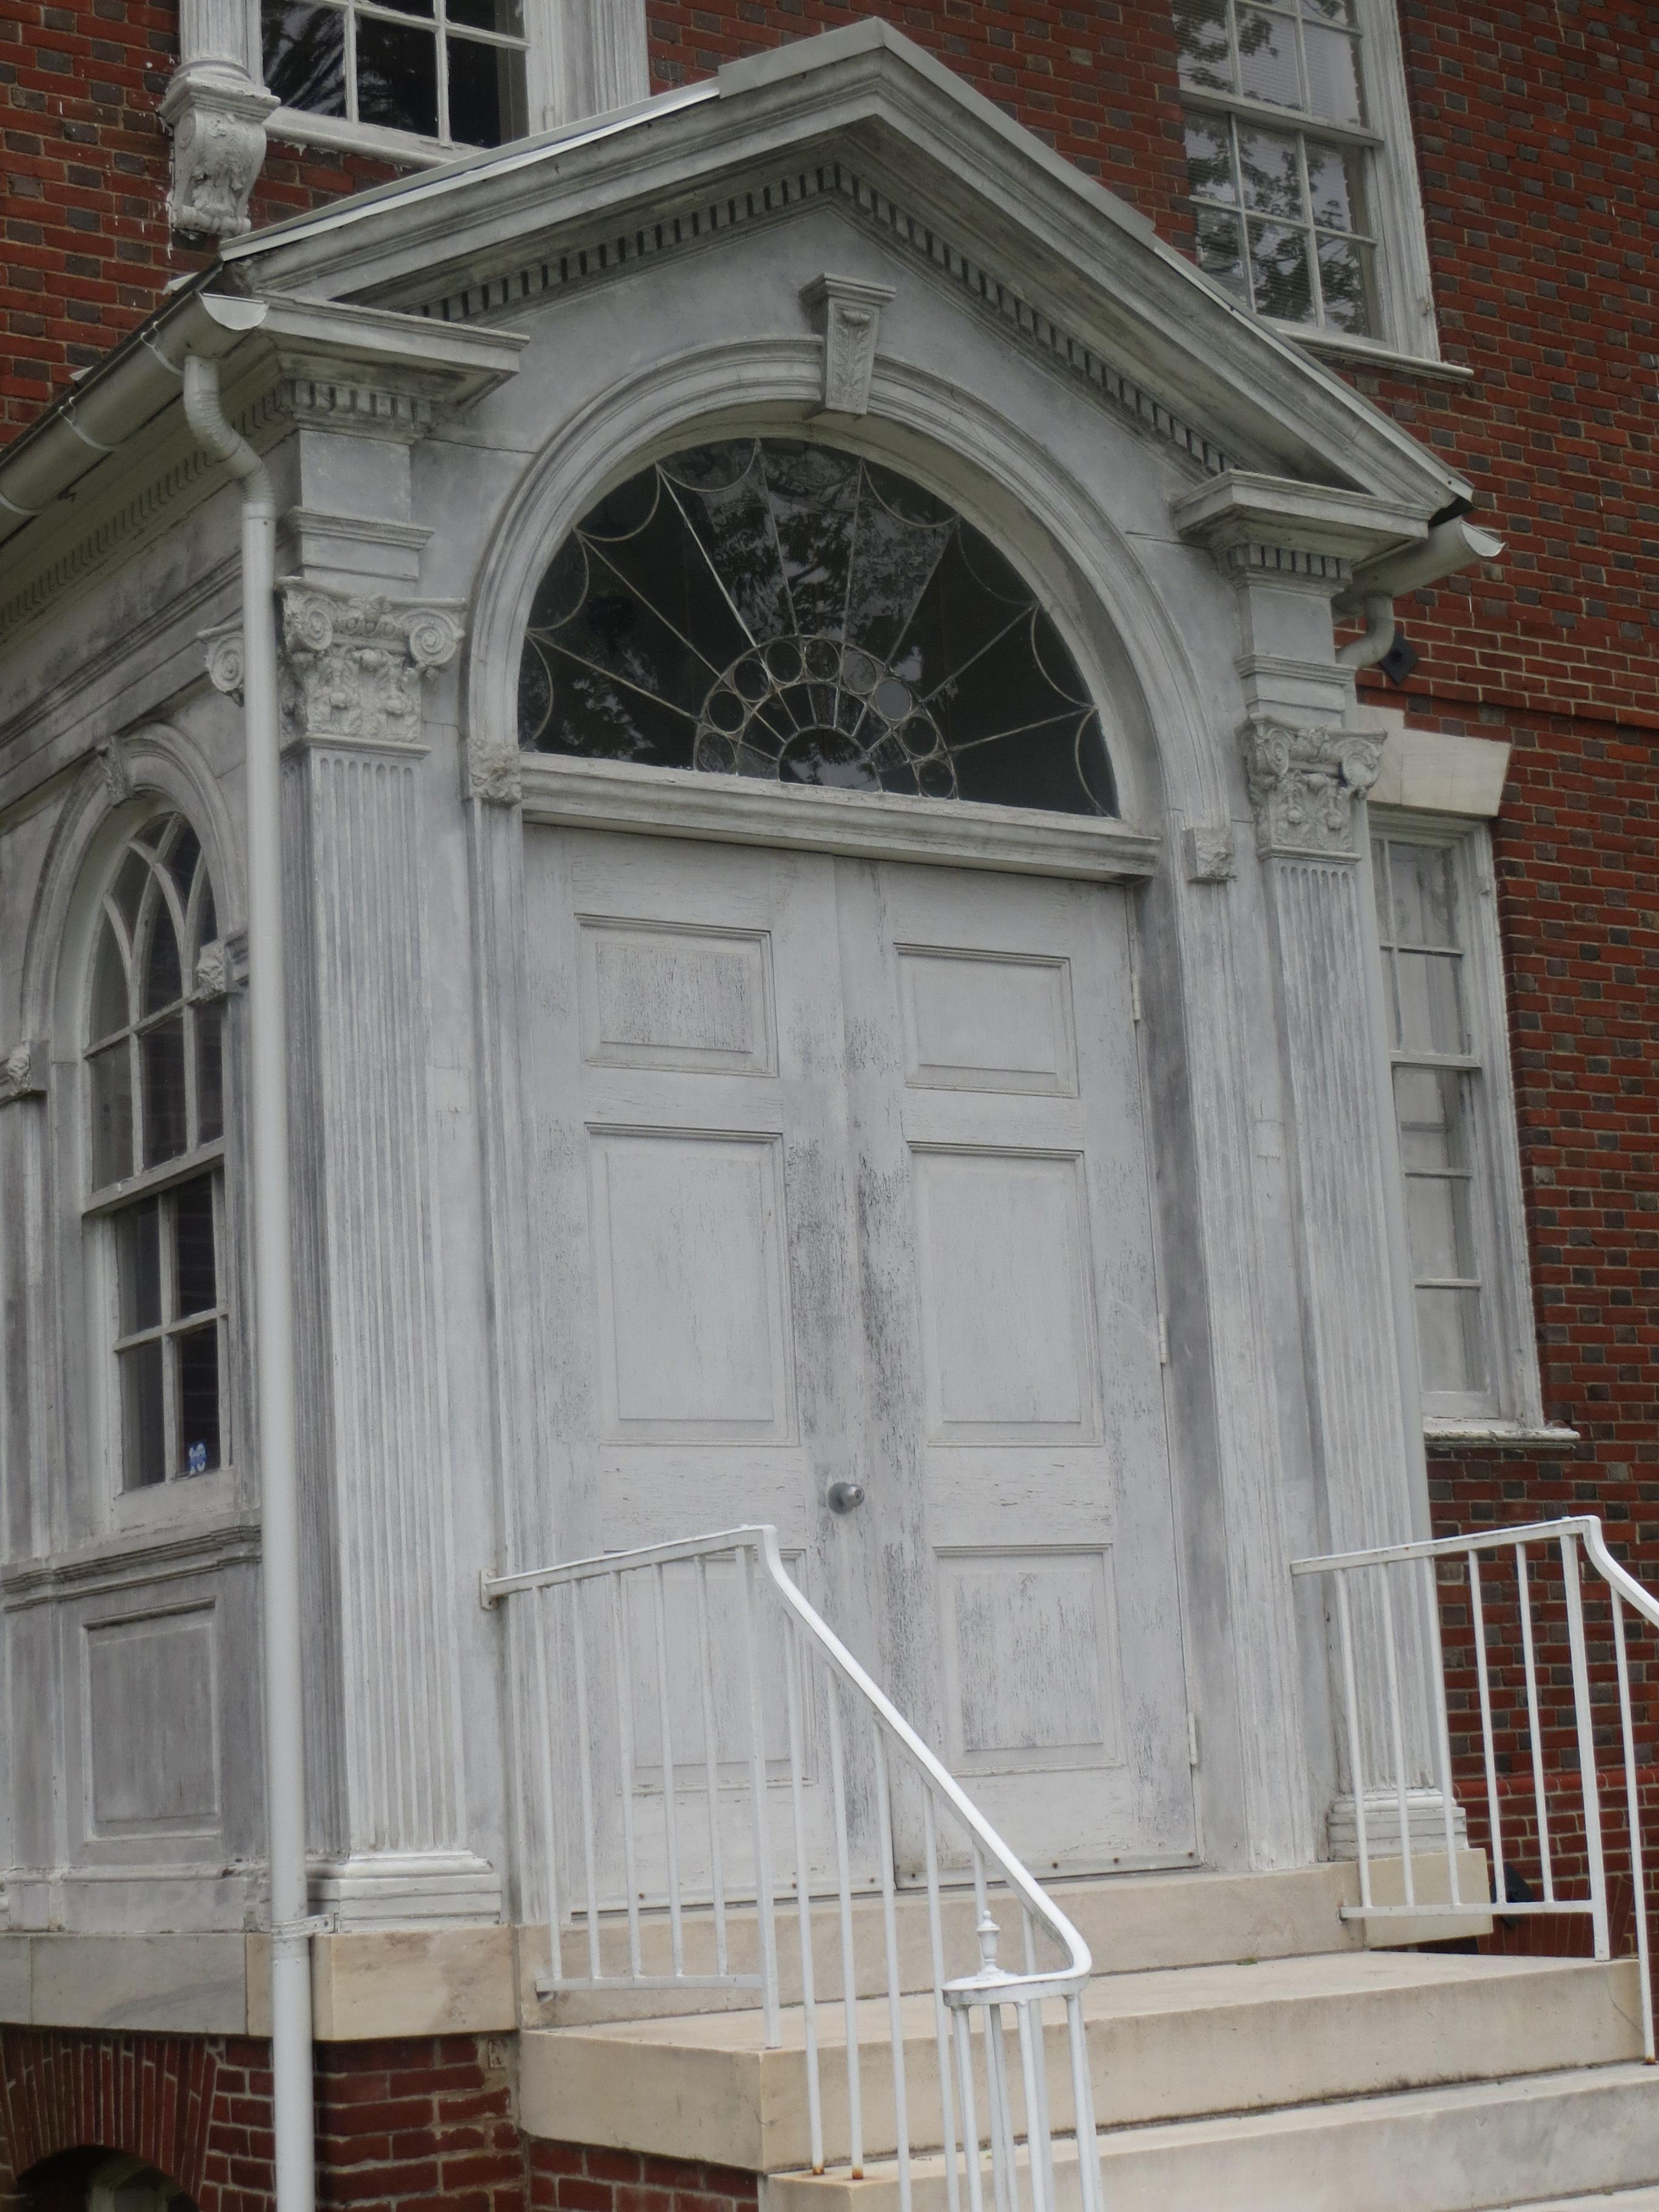 File:Hannah More Academy door (21591132102).jpg & File:Hannah More Academy door (21591132102).jpg - Wikimedia Commons Pezcame.Com